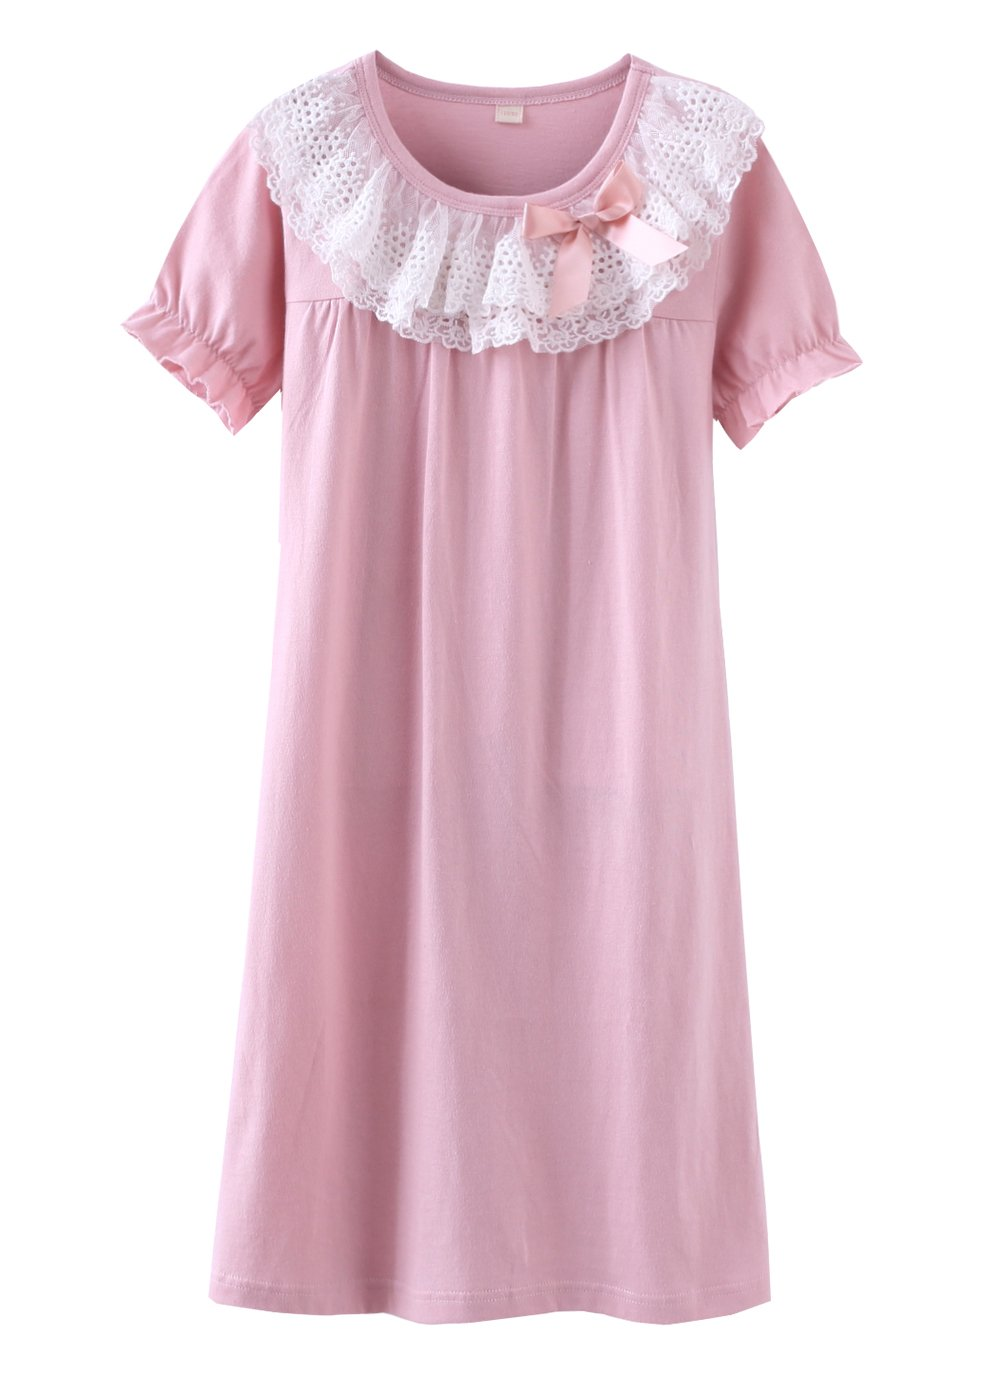 Wsorhui Girls Short Sleeve Nightgowns Soft Cotton Lace Bowknot Princess Sleepwear Nightdress